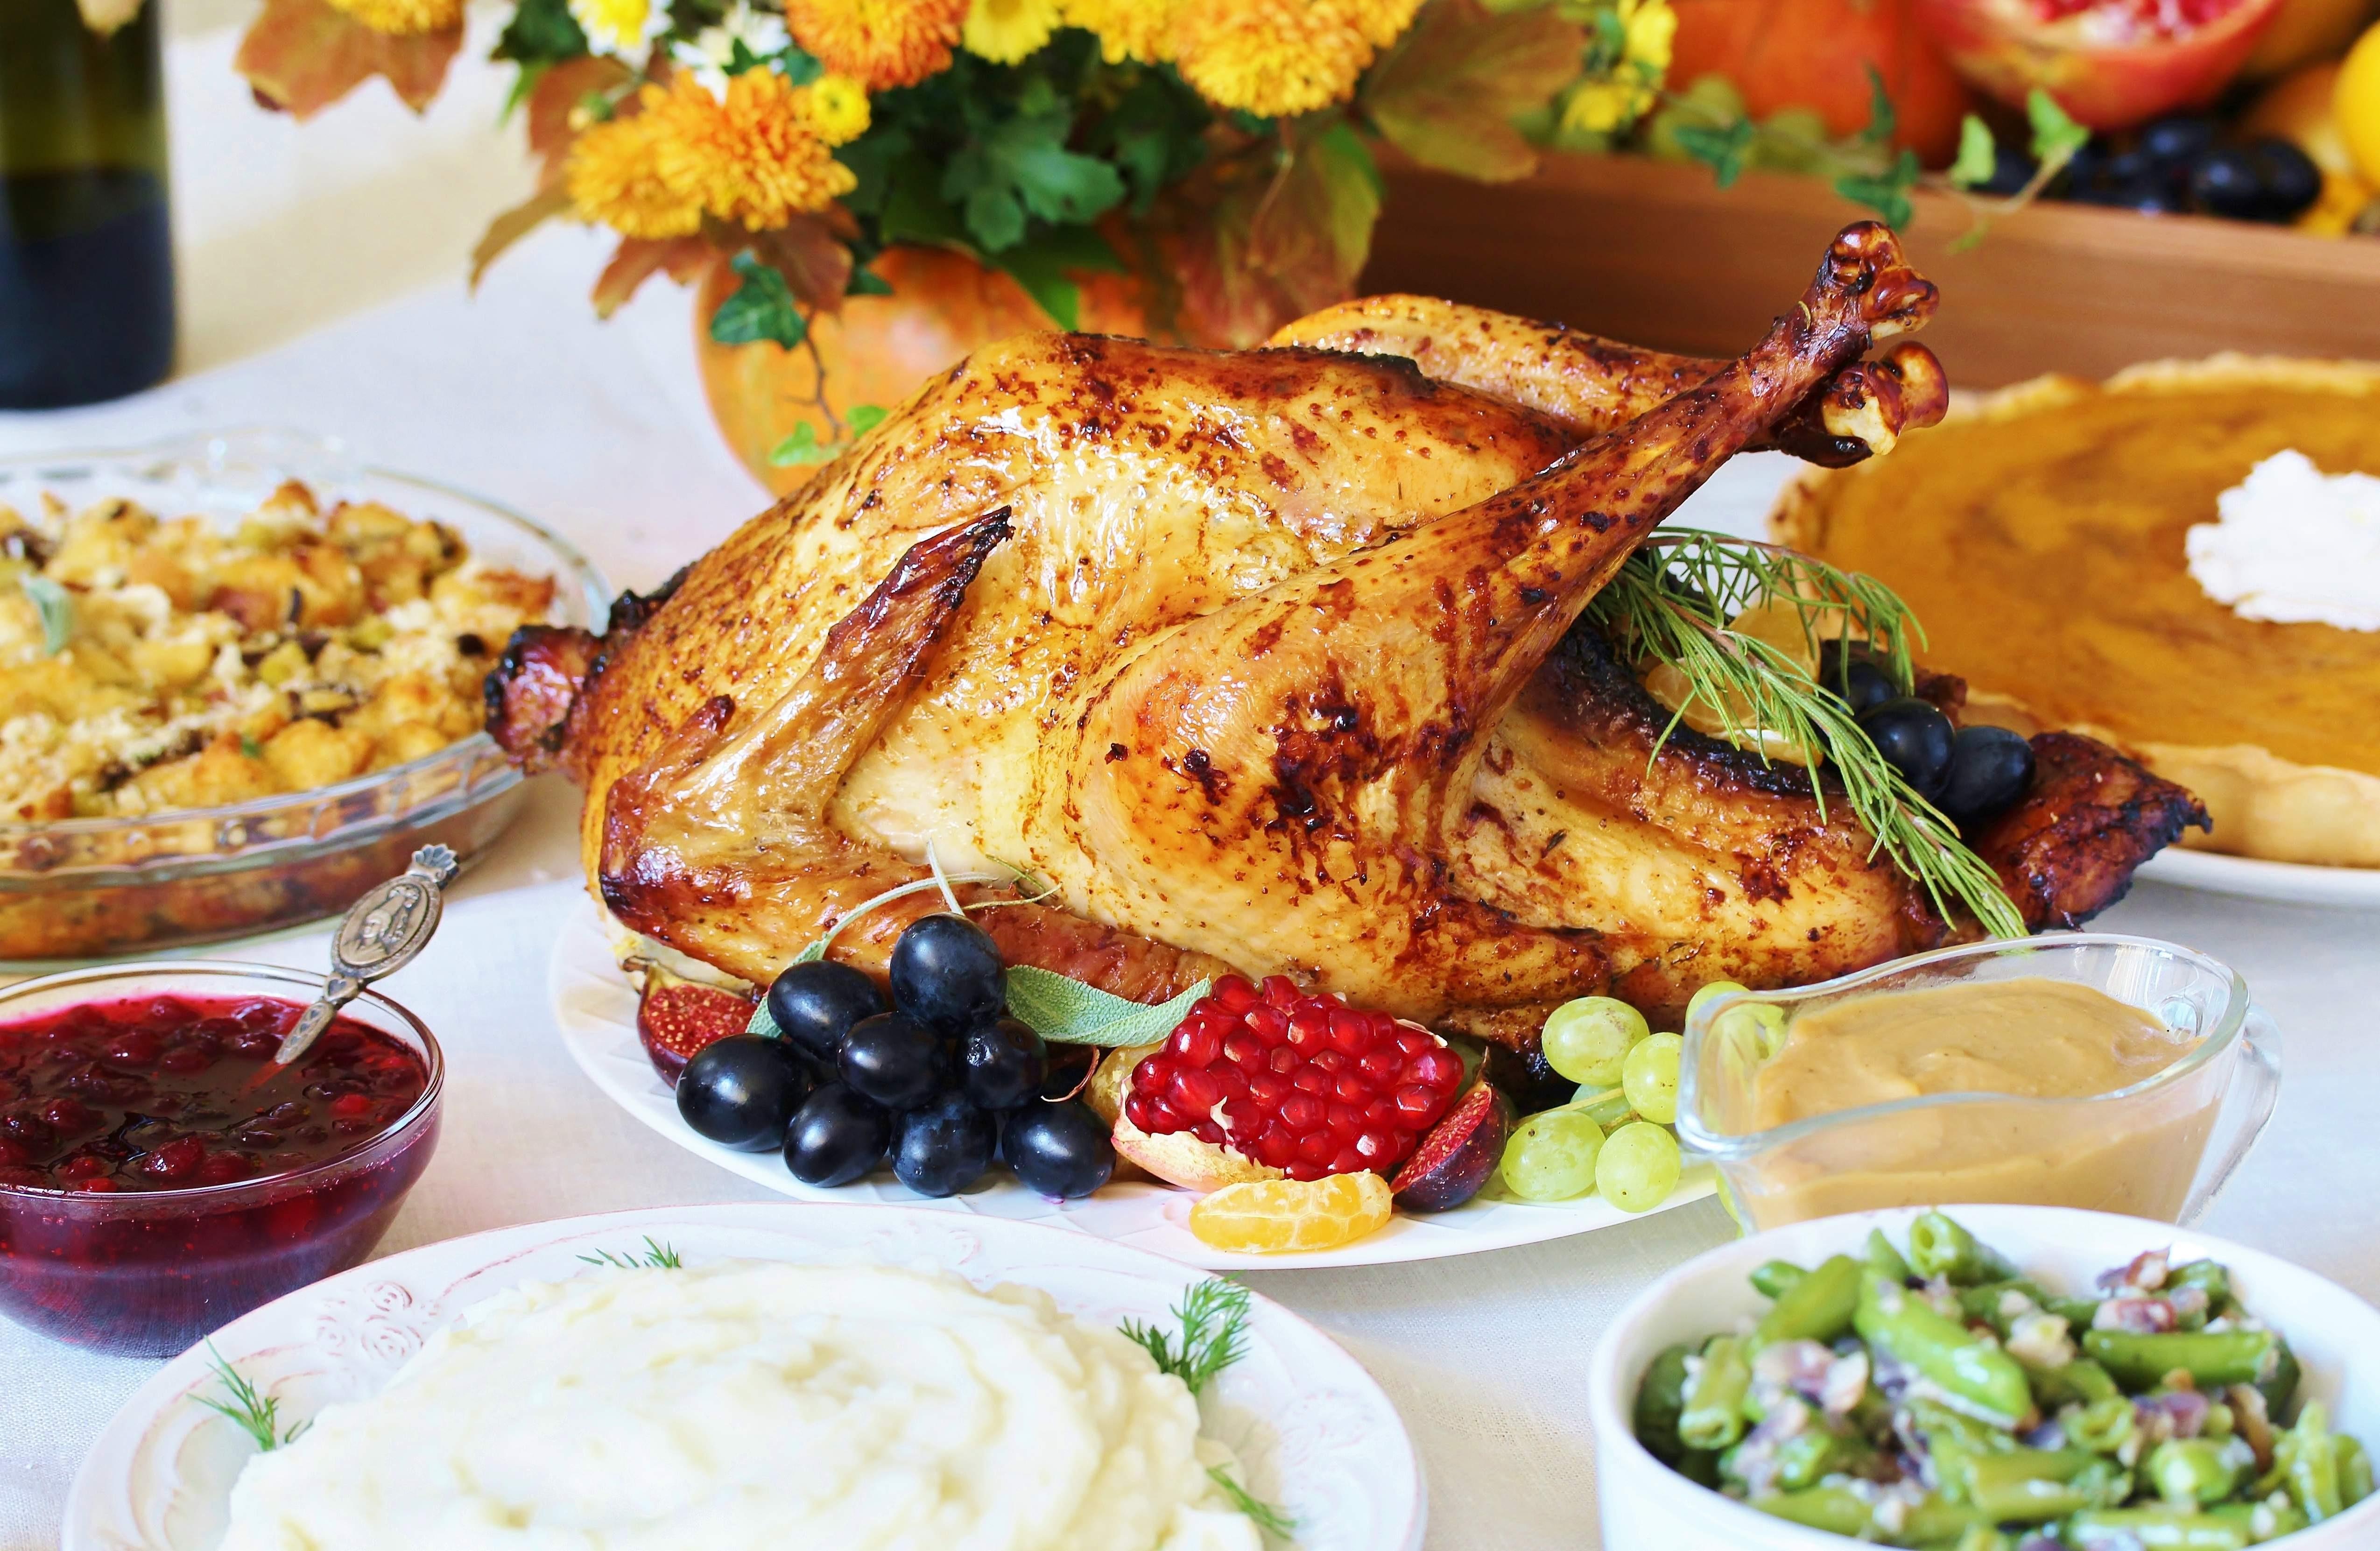 Breakfast Restaurants Open On Thanksgiving  Best restaurants open on Thanksgiving 2017 which offer